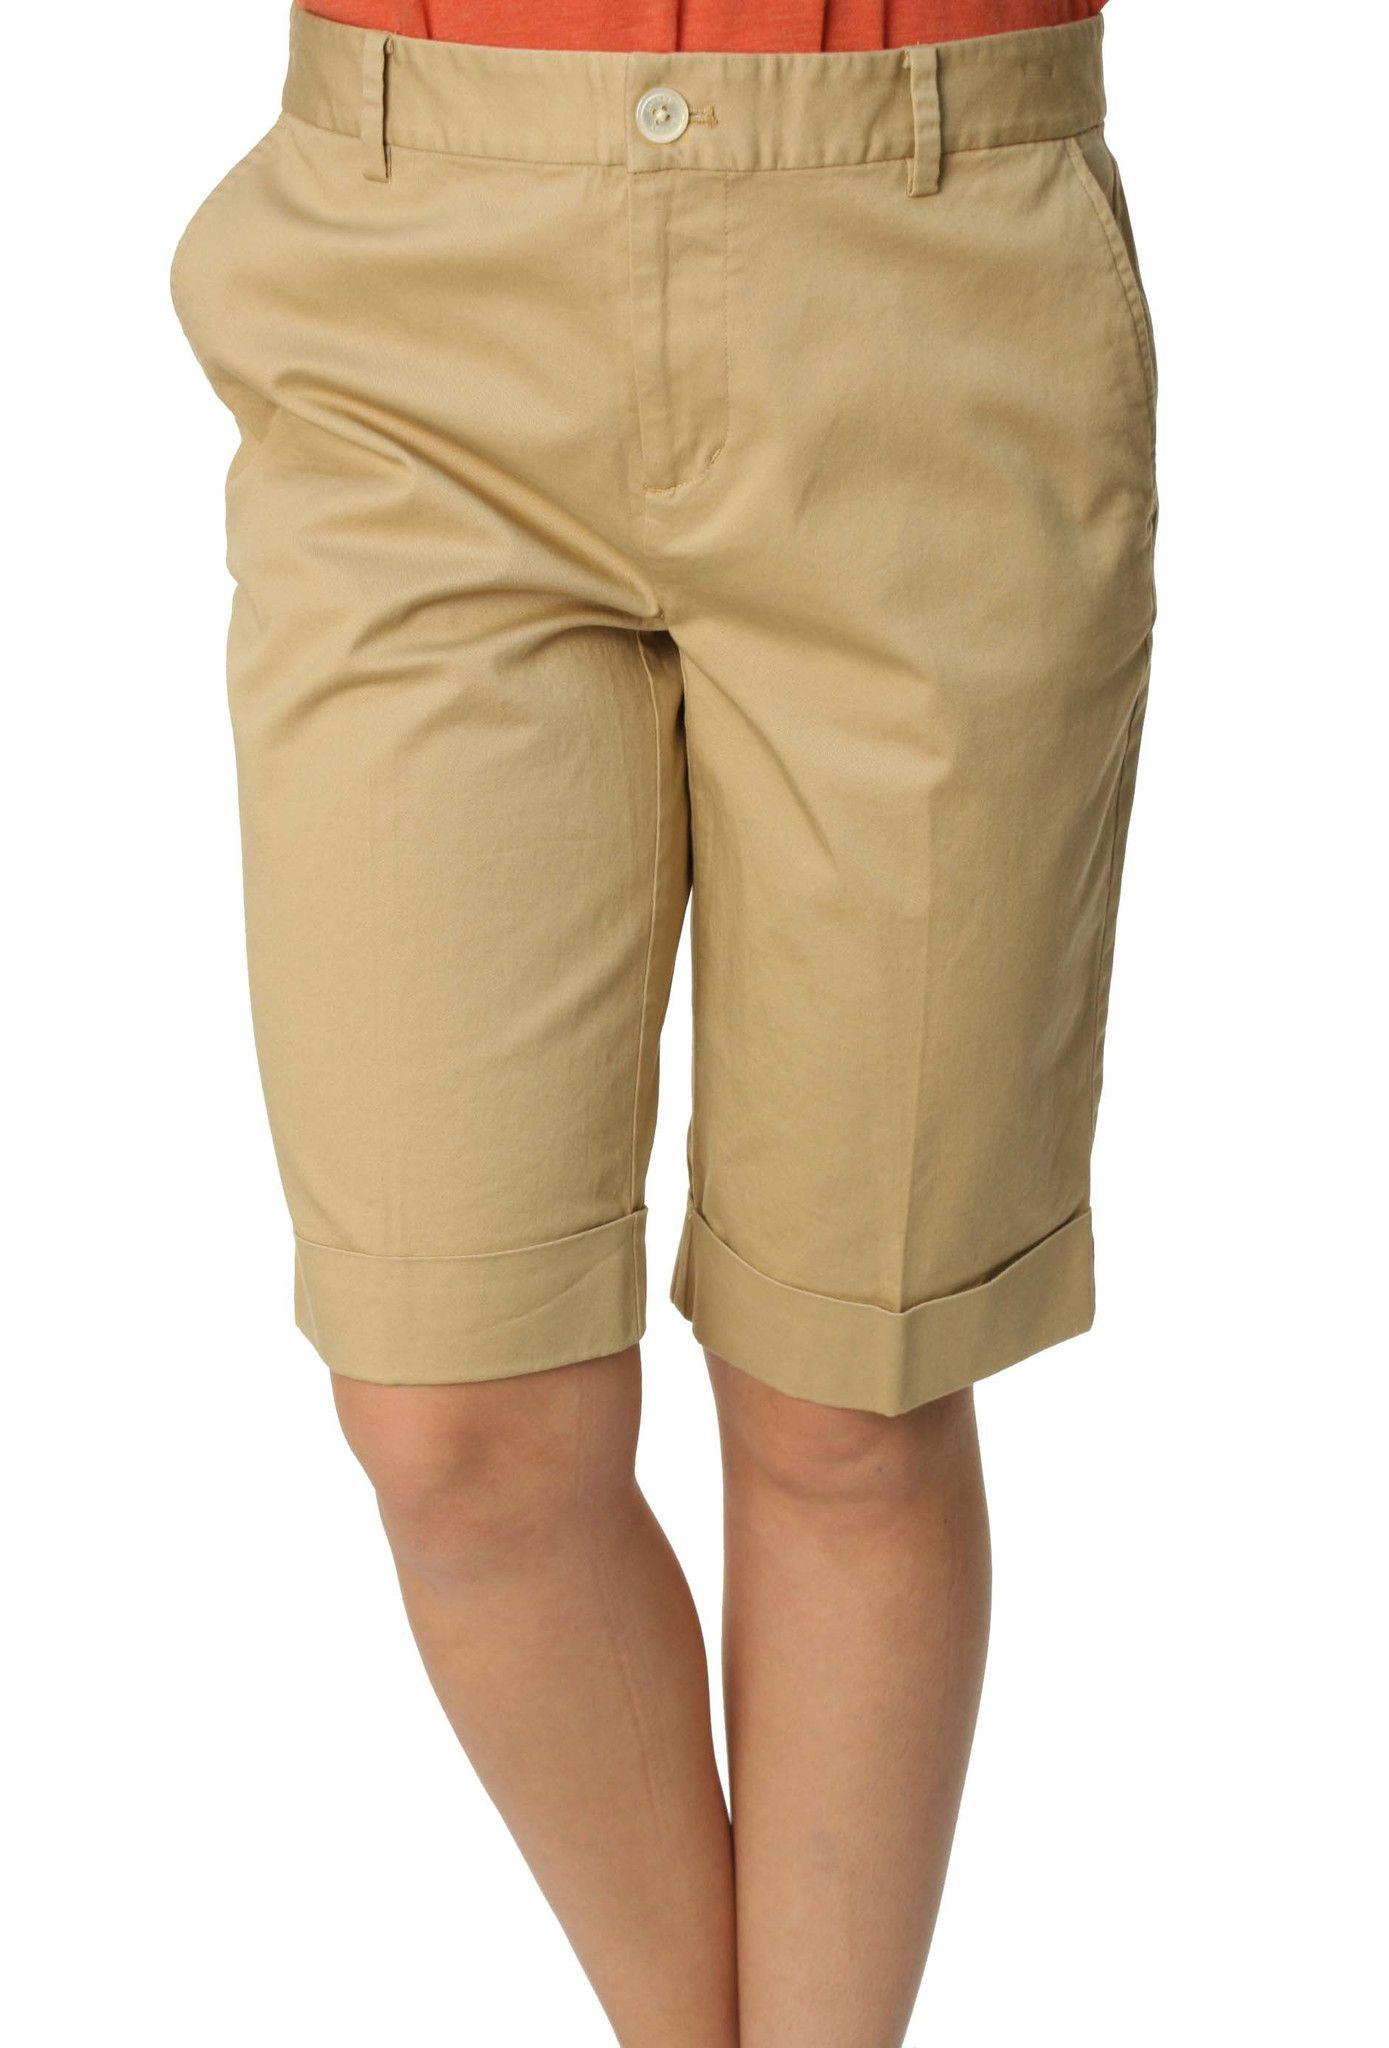 Ralph Lauren Green Label Women's Knee Length Shorts